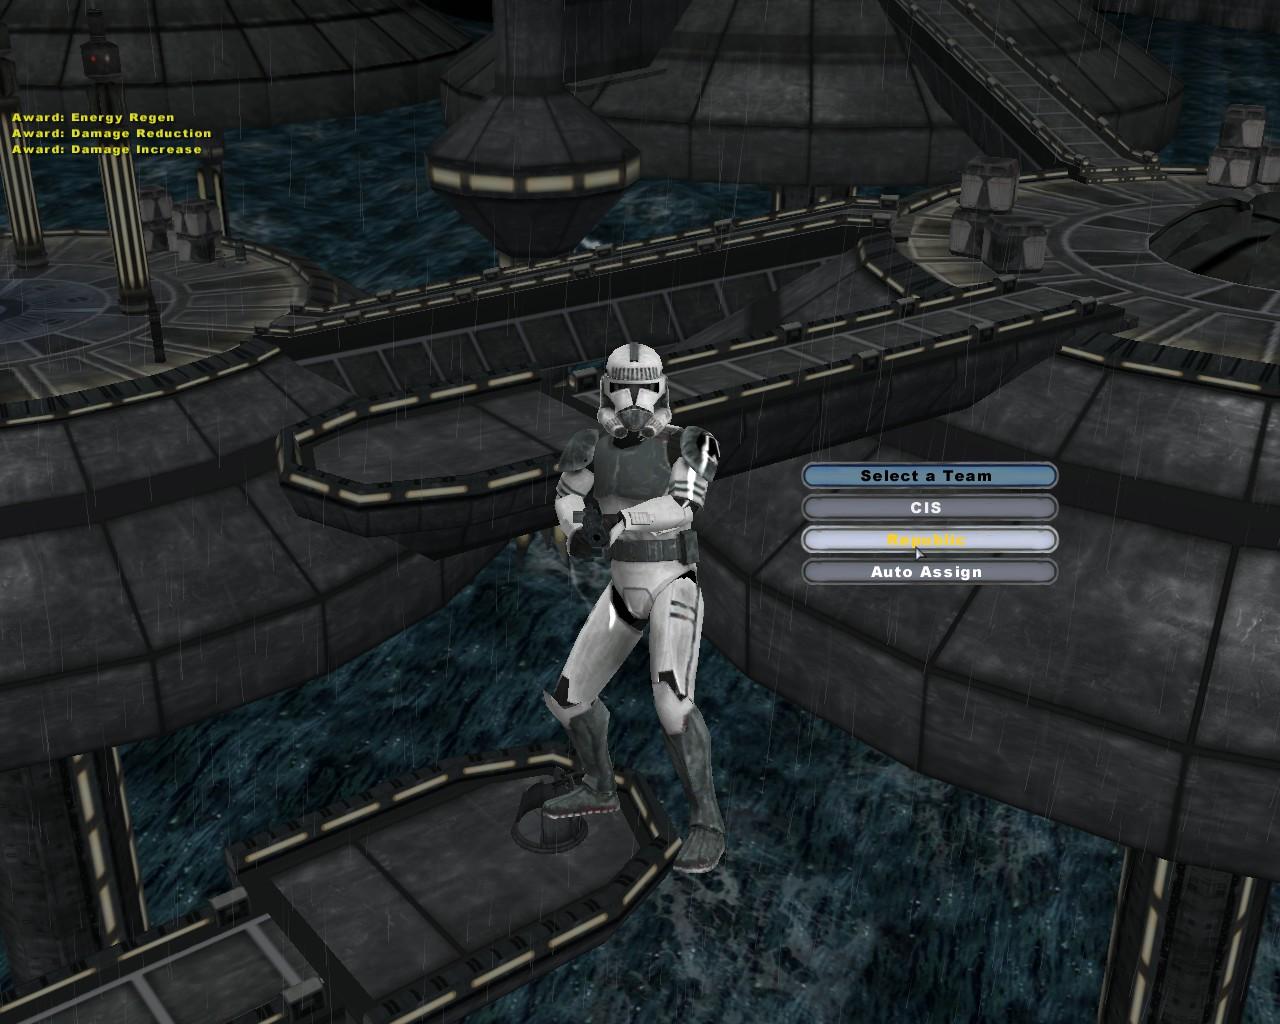 how to get star wars battlefront 2 mods to work